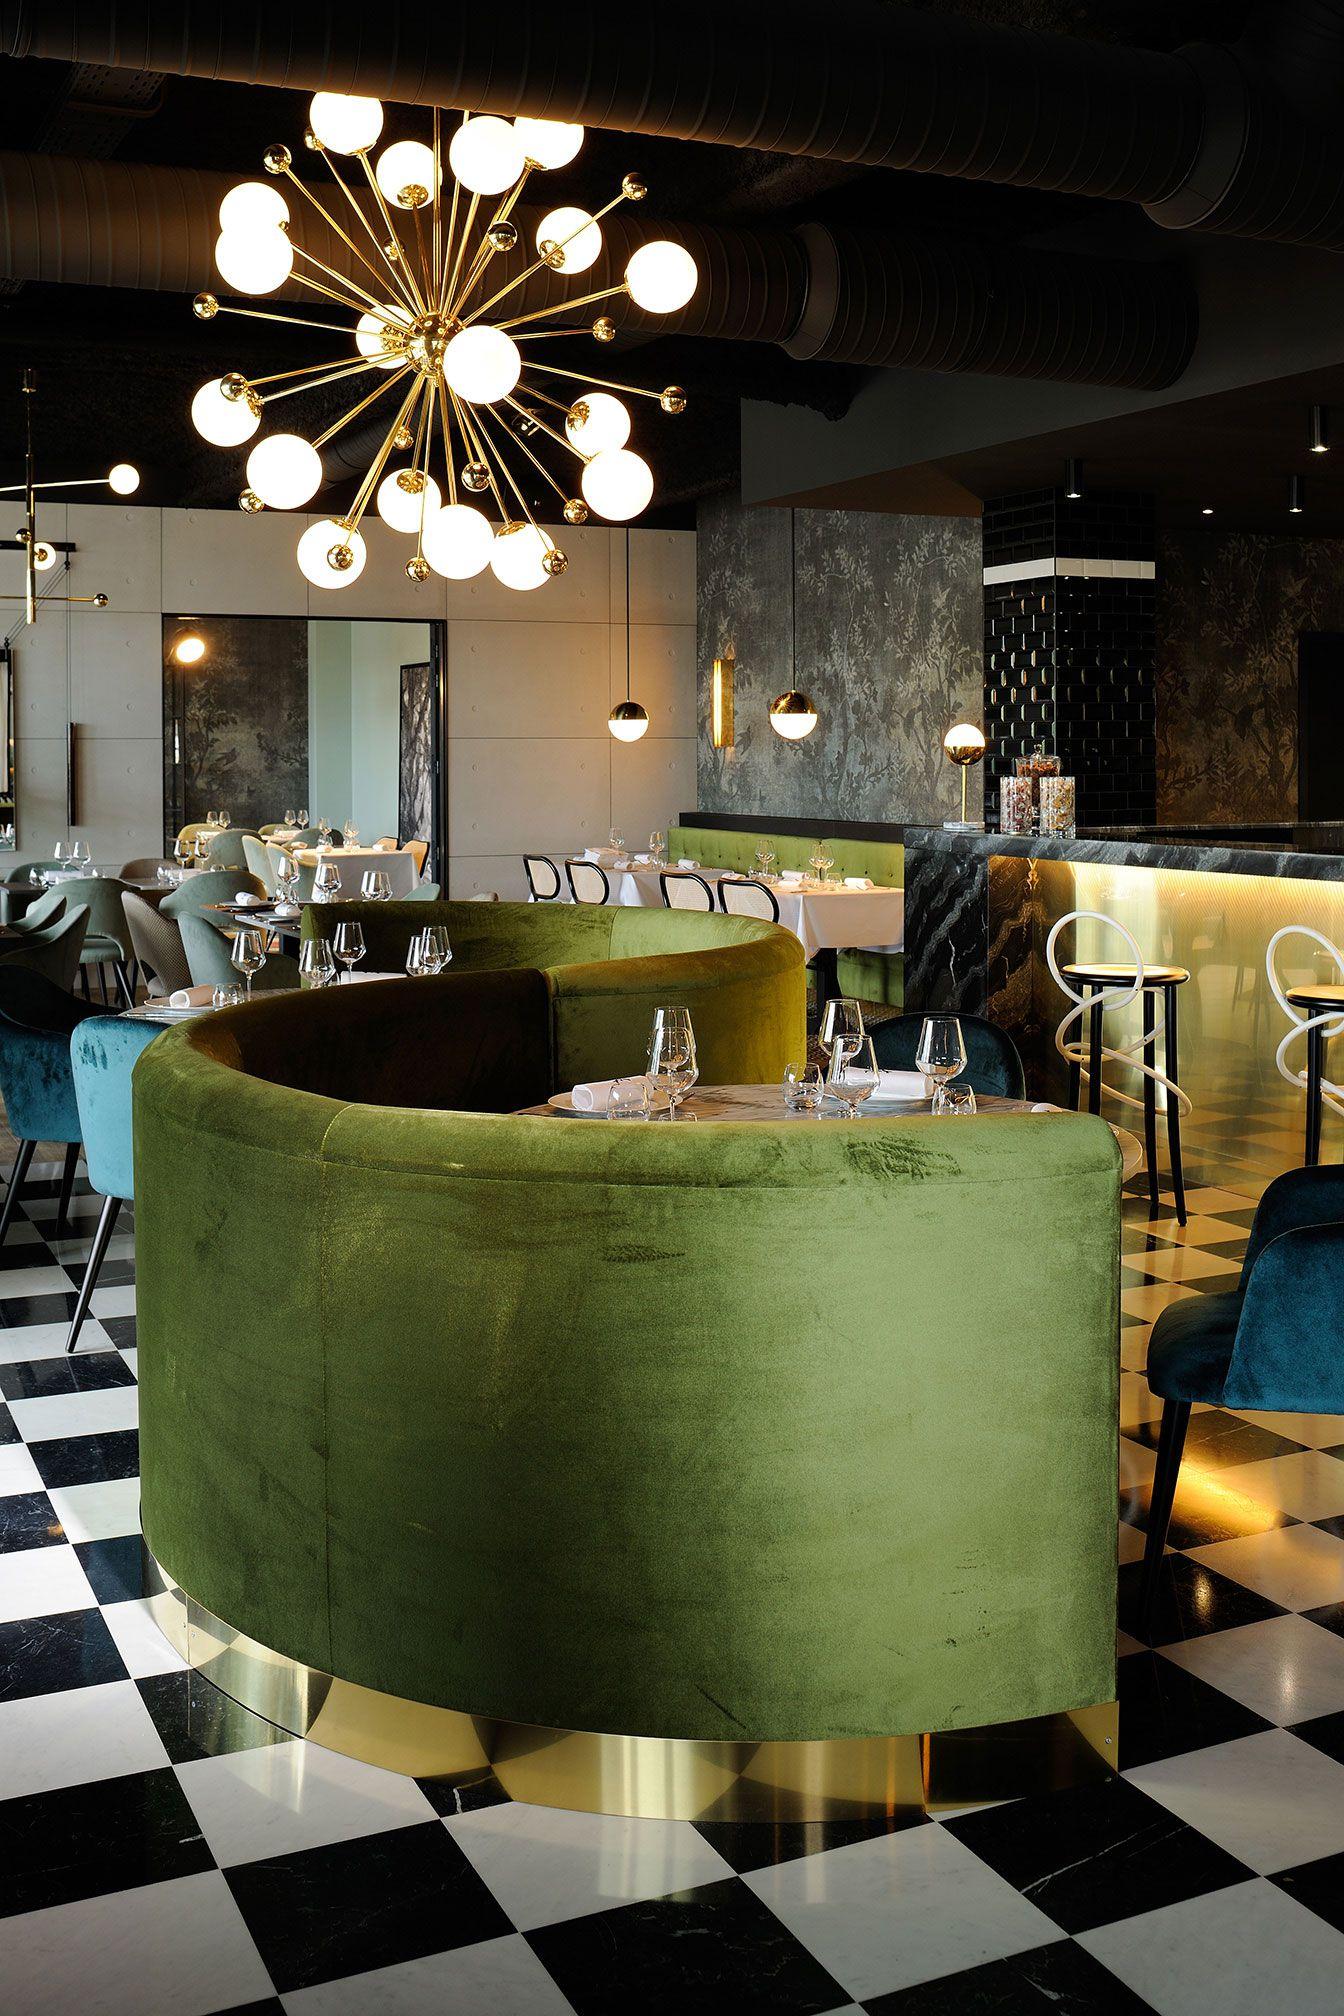 La foret noire restaurant in chaponost france by claude for Innendekoration restaurant